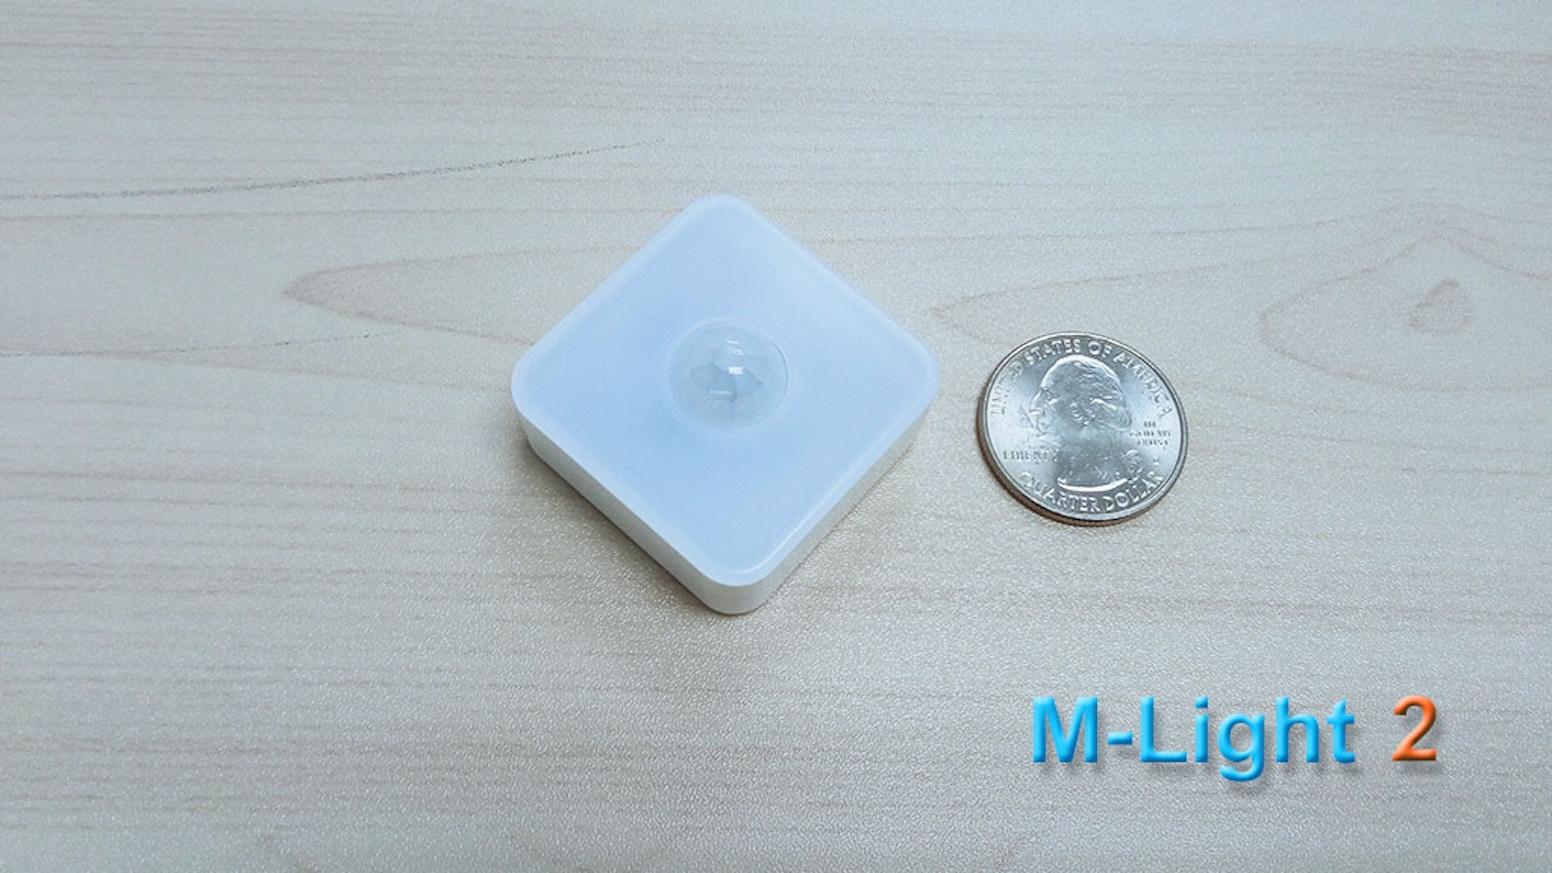 Led night light kickstarter - M Light 2 The Smallest Adjustable Motion Sensor Night Light